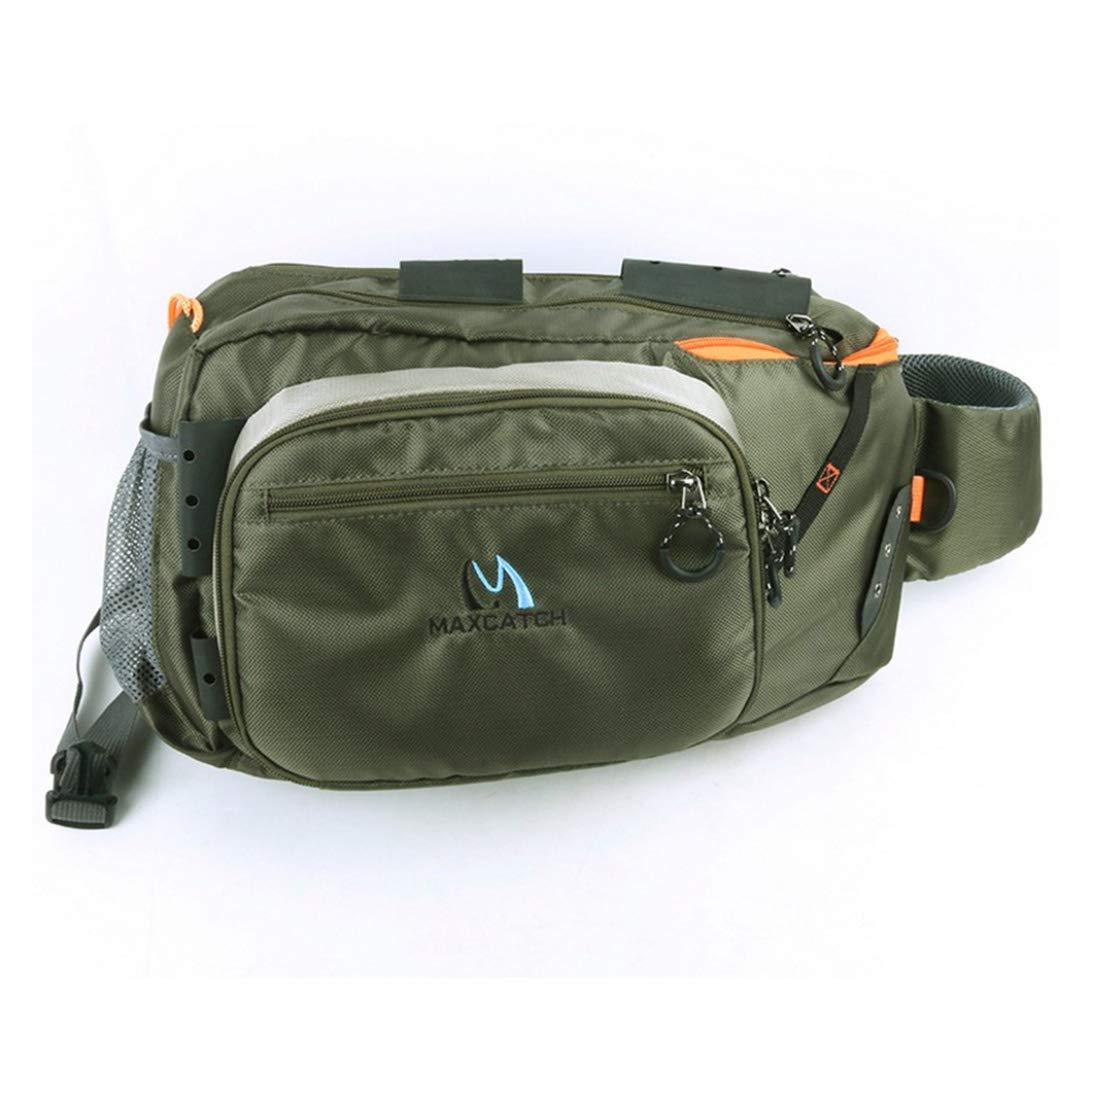 Kunliyin YY1 Outdoor-Durable und praktische Polyester grüne Farbe Messenger Raft Fishing Bag (Farbe : Grün)